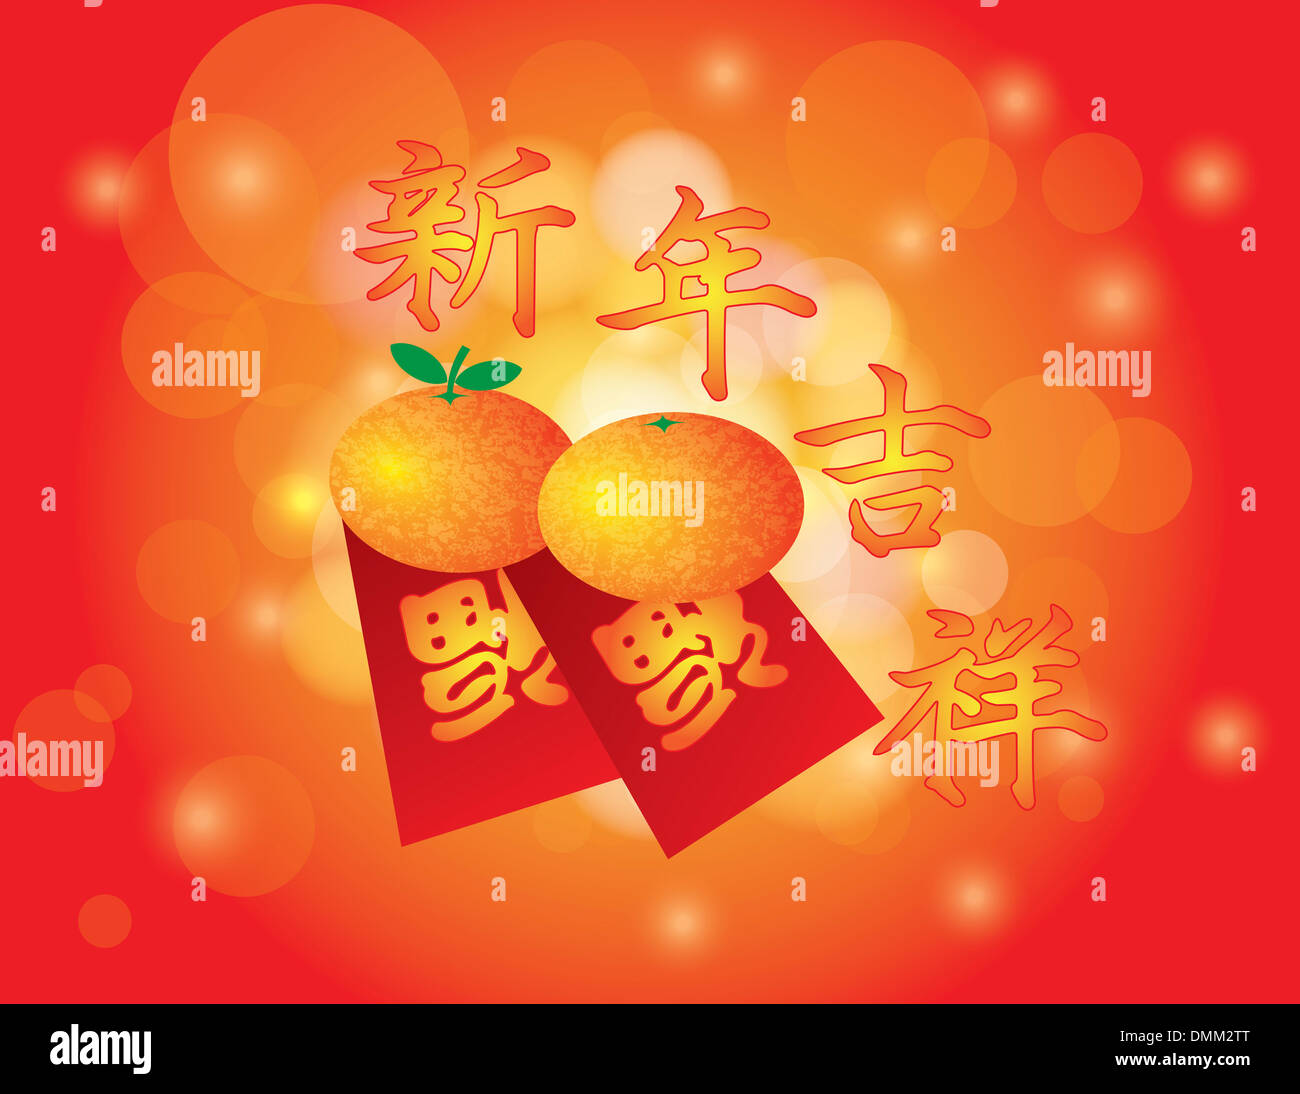 Chinese new year mandarin oranges with good luck red money packets chinese new year mandarin oranges with good luck red money packets on festive golden bokeh background m4hsunfo